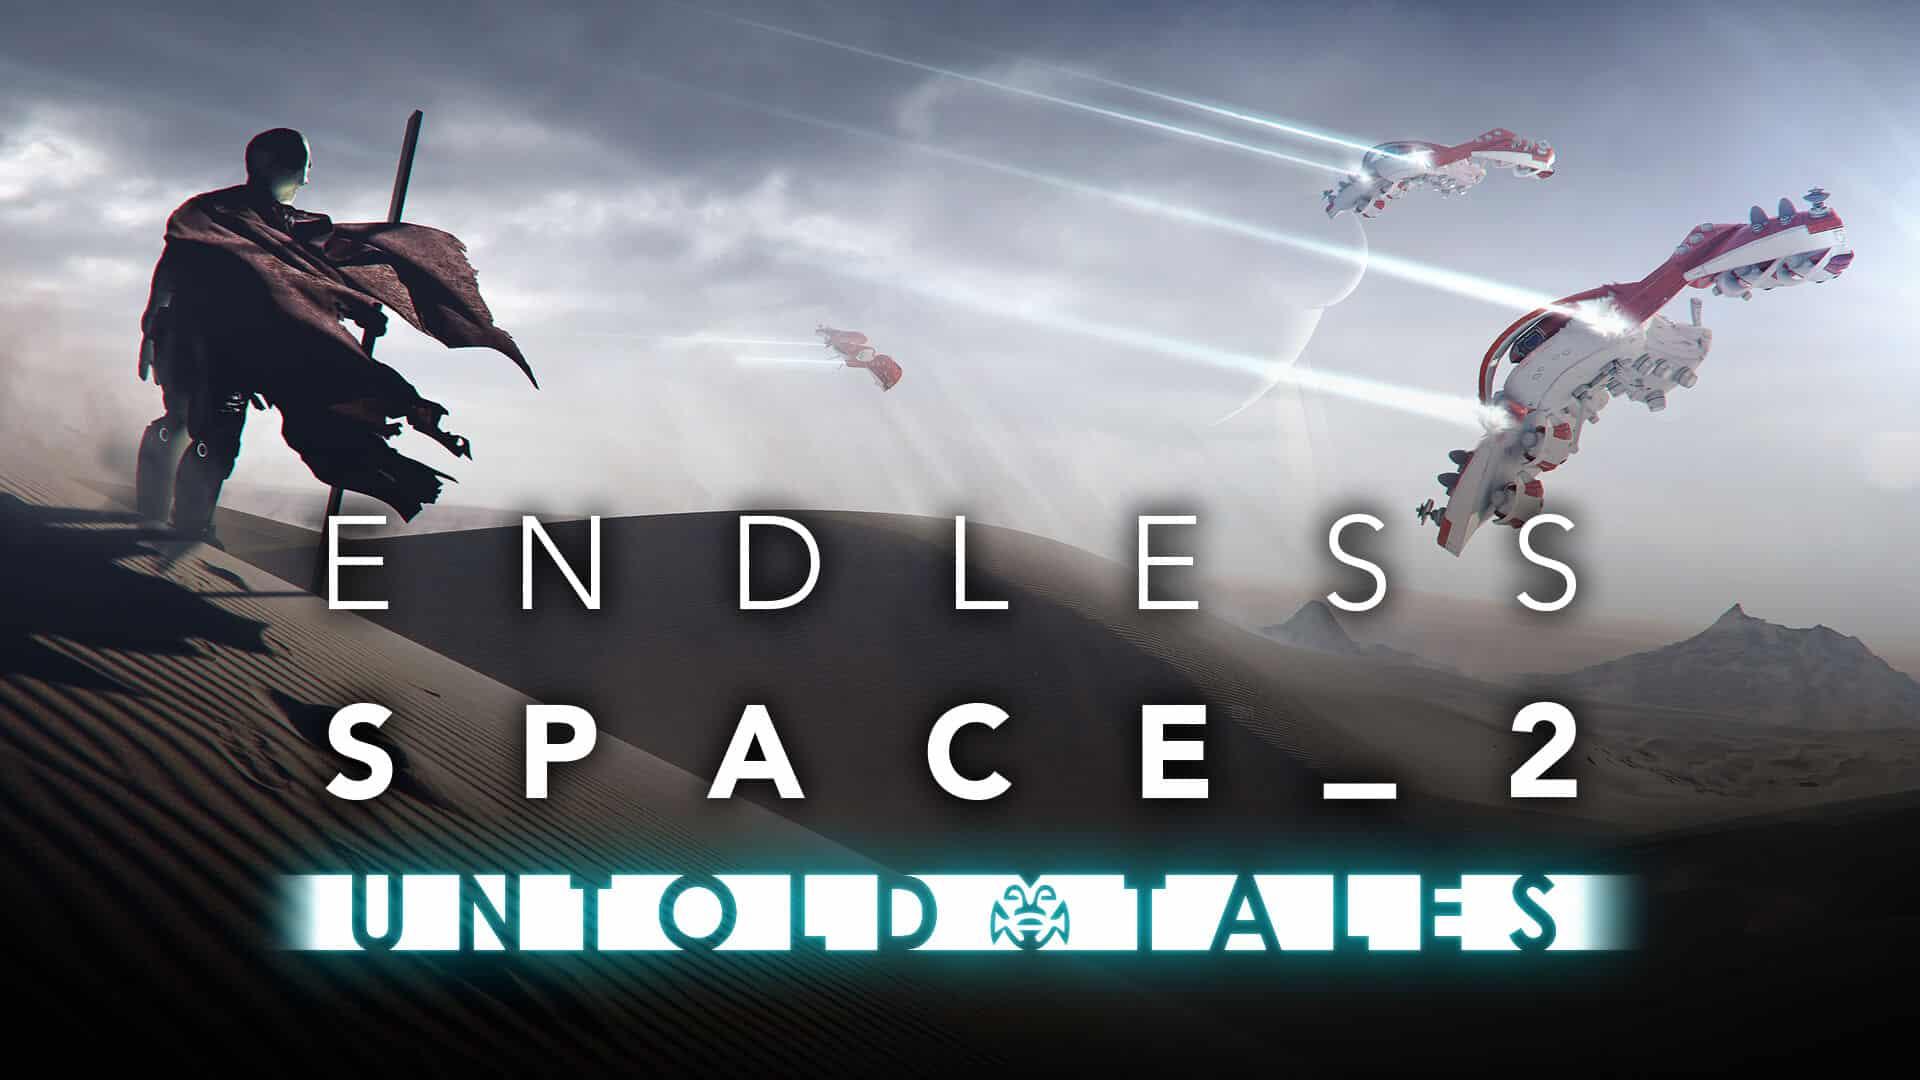 untold tales endless space 2 - Due contenuti aggiuntivi a sorpresa per Endless Space 2